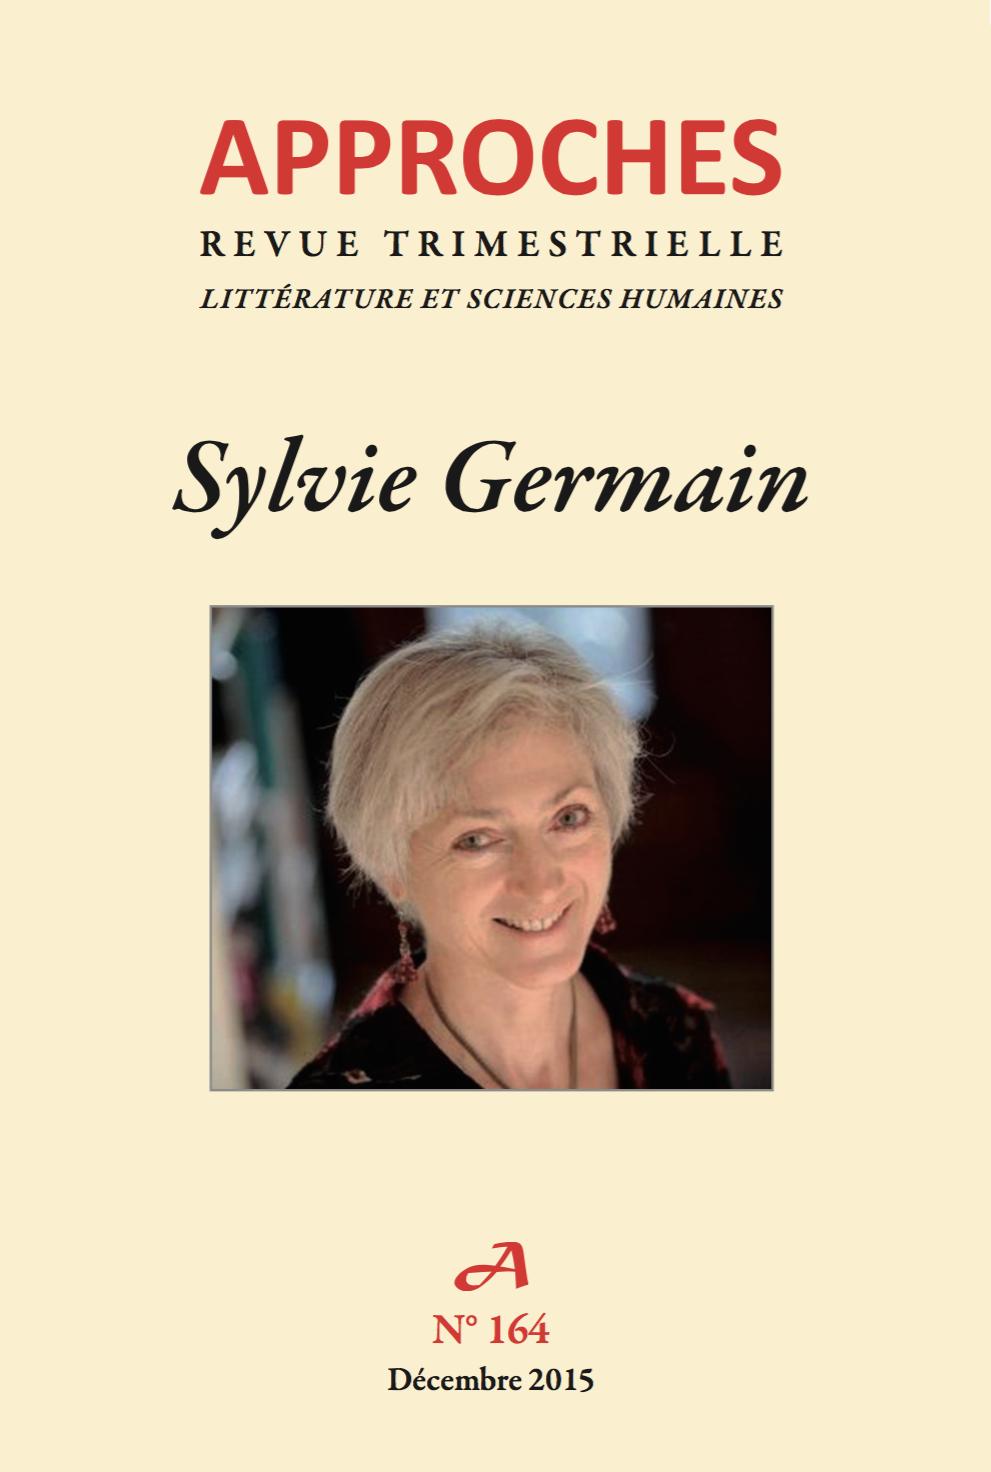 Approches, n°164, décembre 2015: «Sylvie Germain»